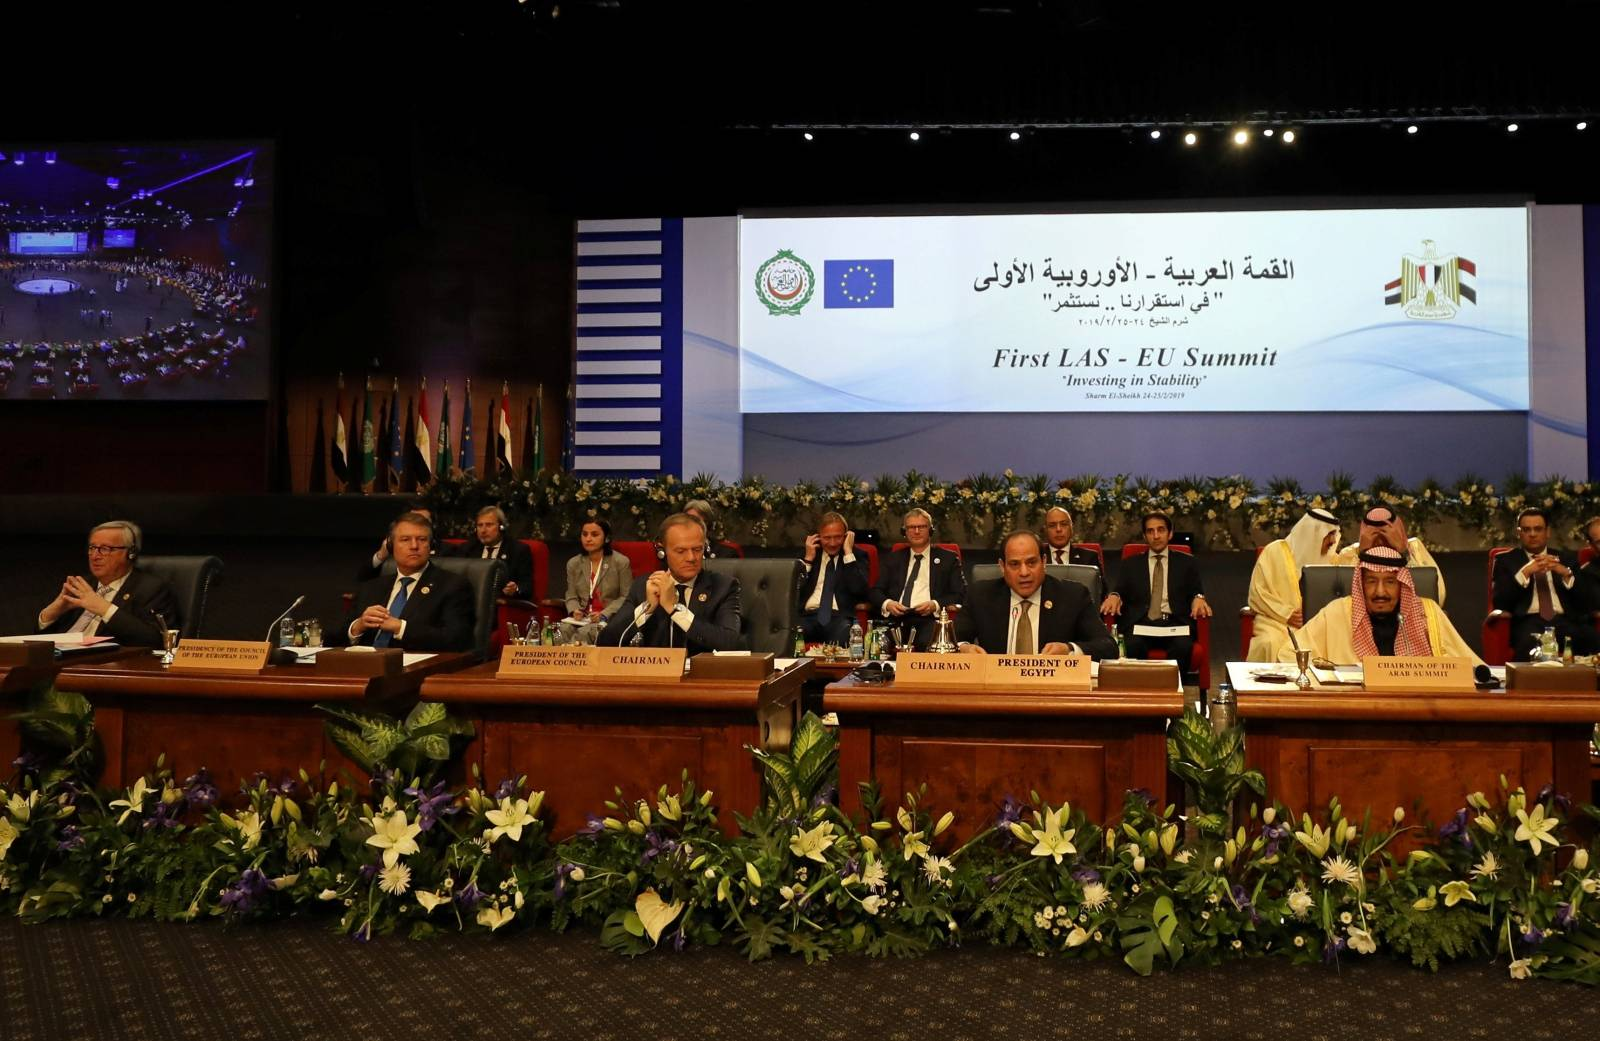 Egyptian President Abdel Fattah al-Sisi speaks during Arab league and EU summit, in Sharm el-Sheikh